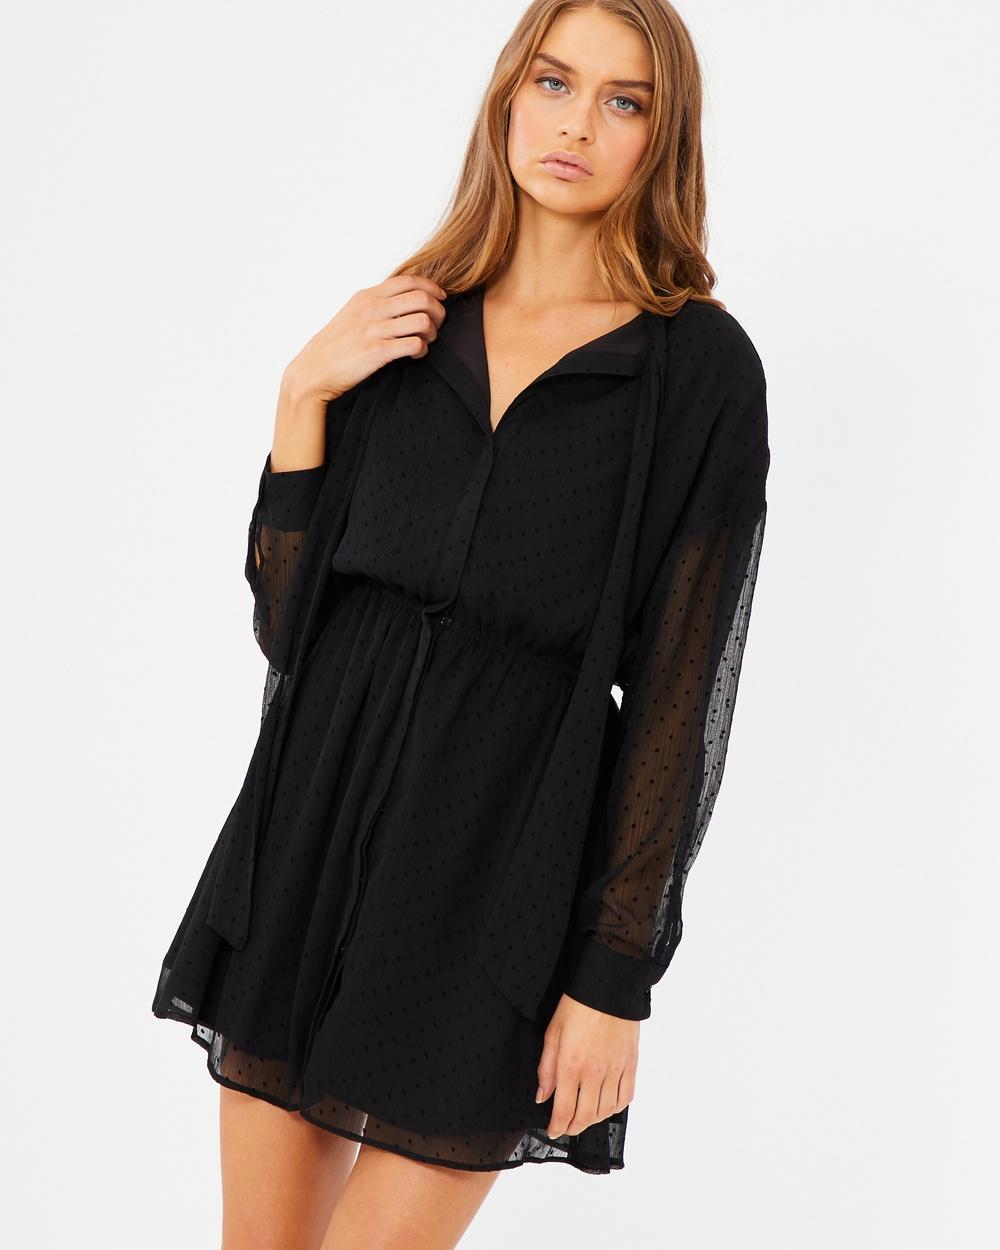 Photo of Tussah Black Spot Nevada Shirt Dress - beautiful dress from Tussah online